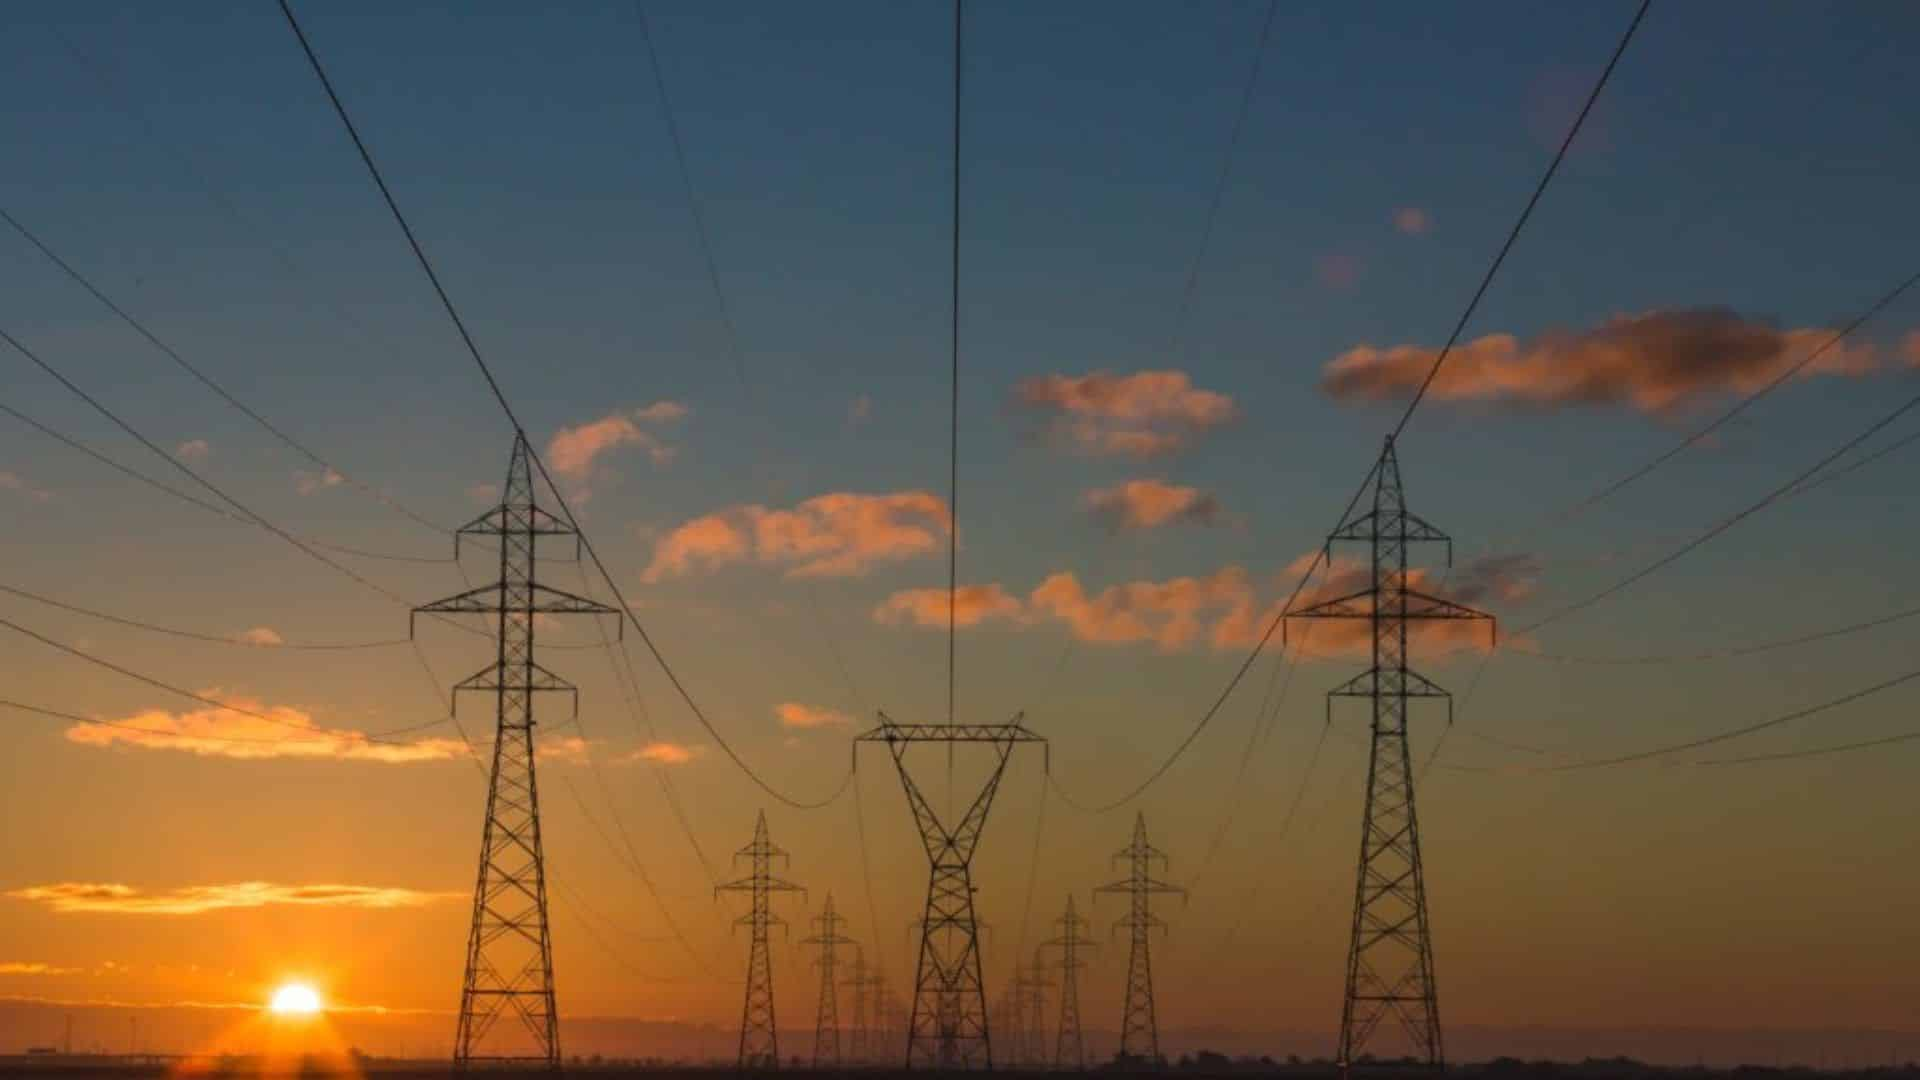 celeo redes brasil, energia elétrica, eletricista